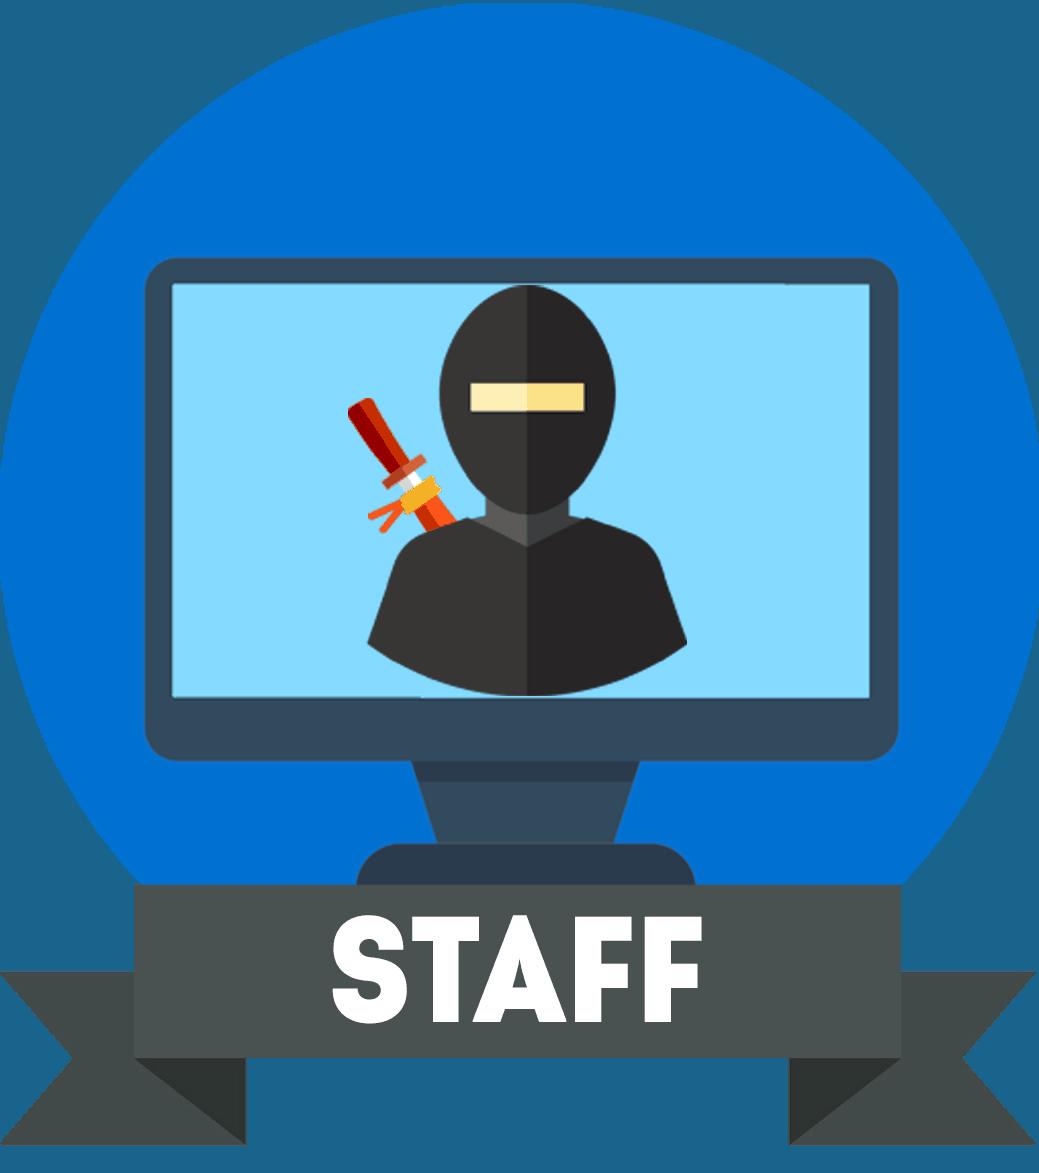 DisplayNinja staff